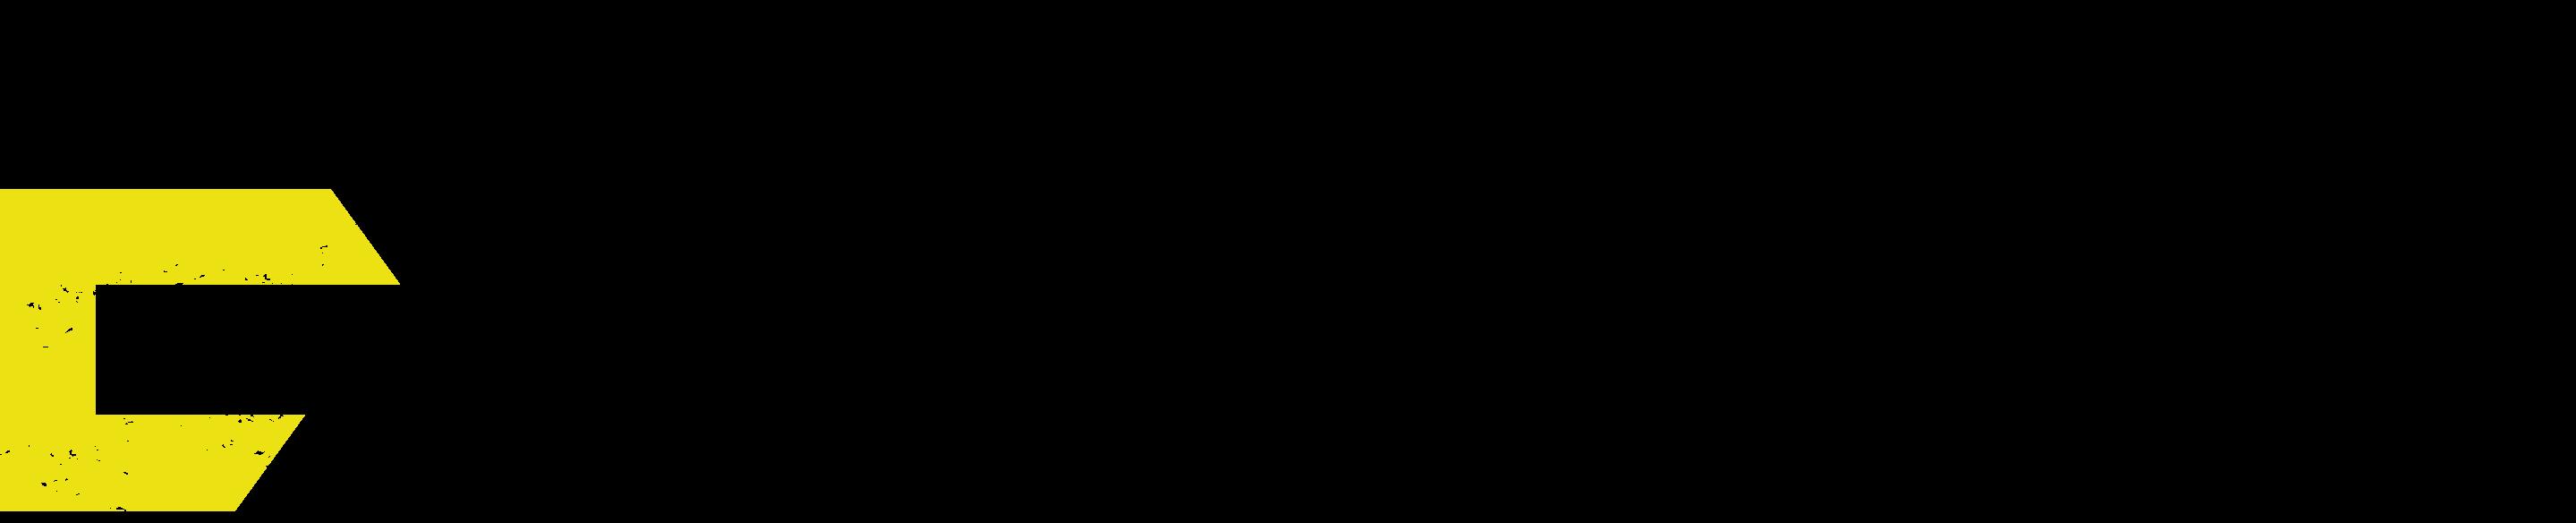 EXentric_grunge_logoskisser (004) SORT